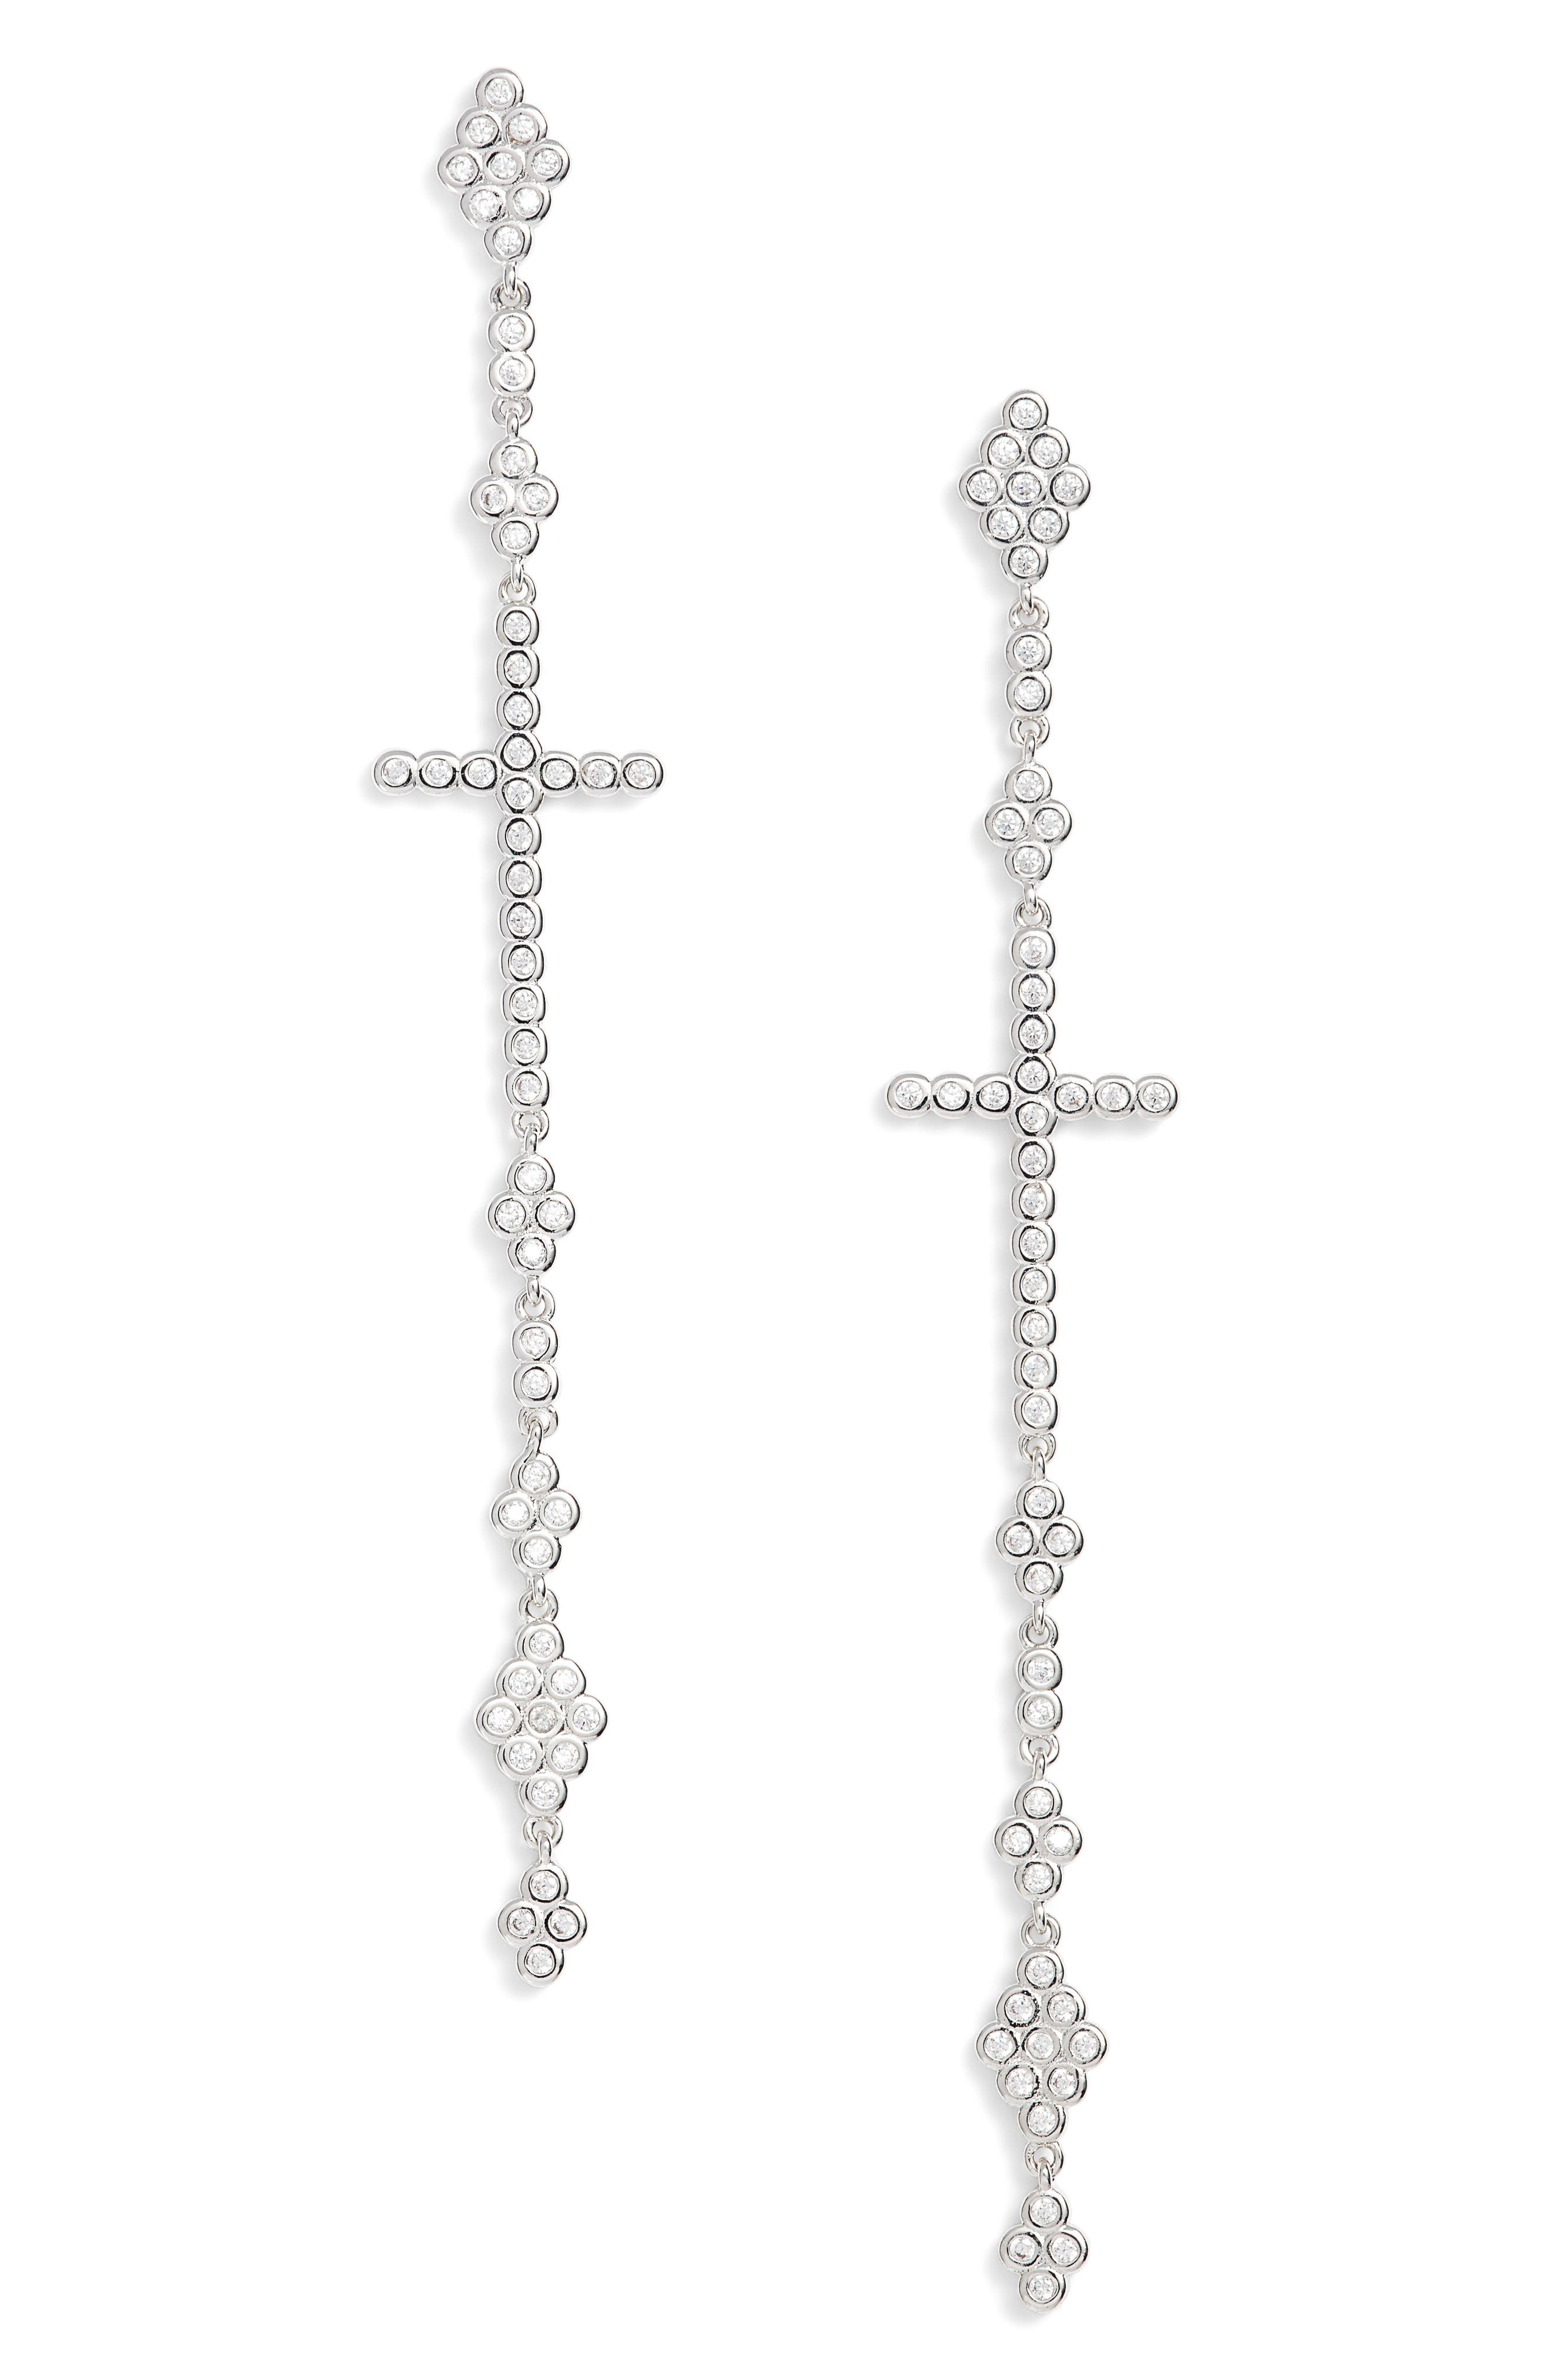 Linear Cross Earrings,                             Main thumbnail 1, color,                             041